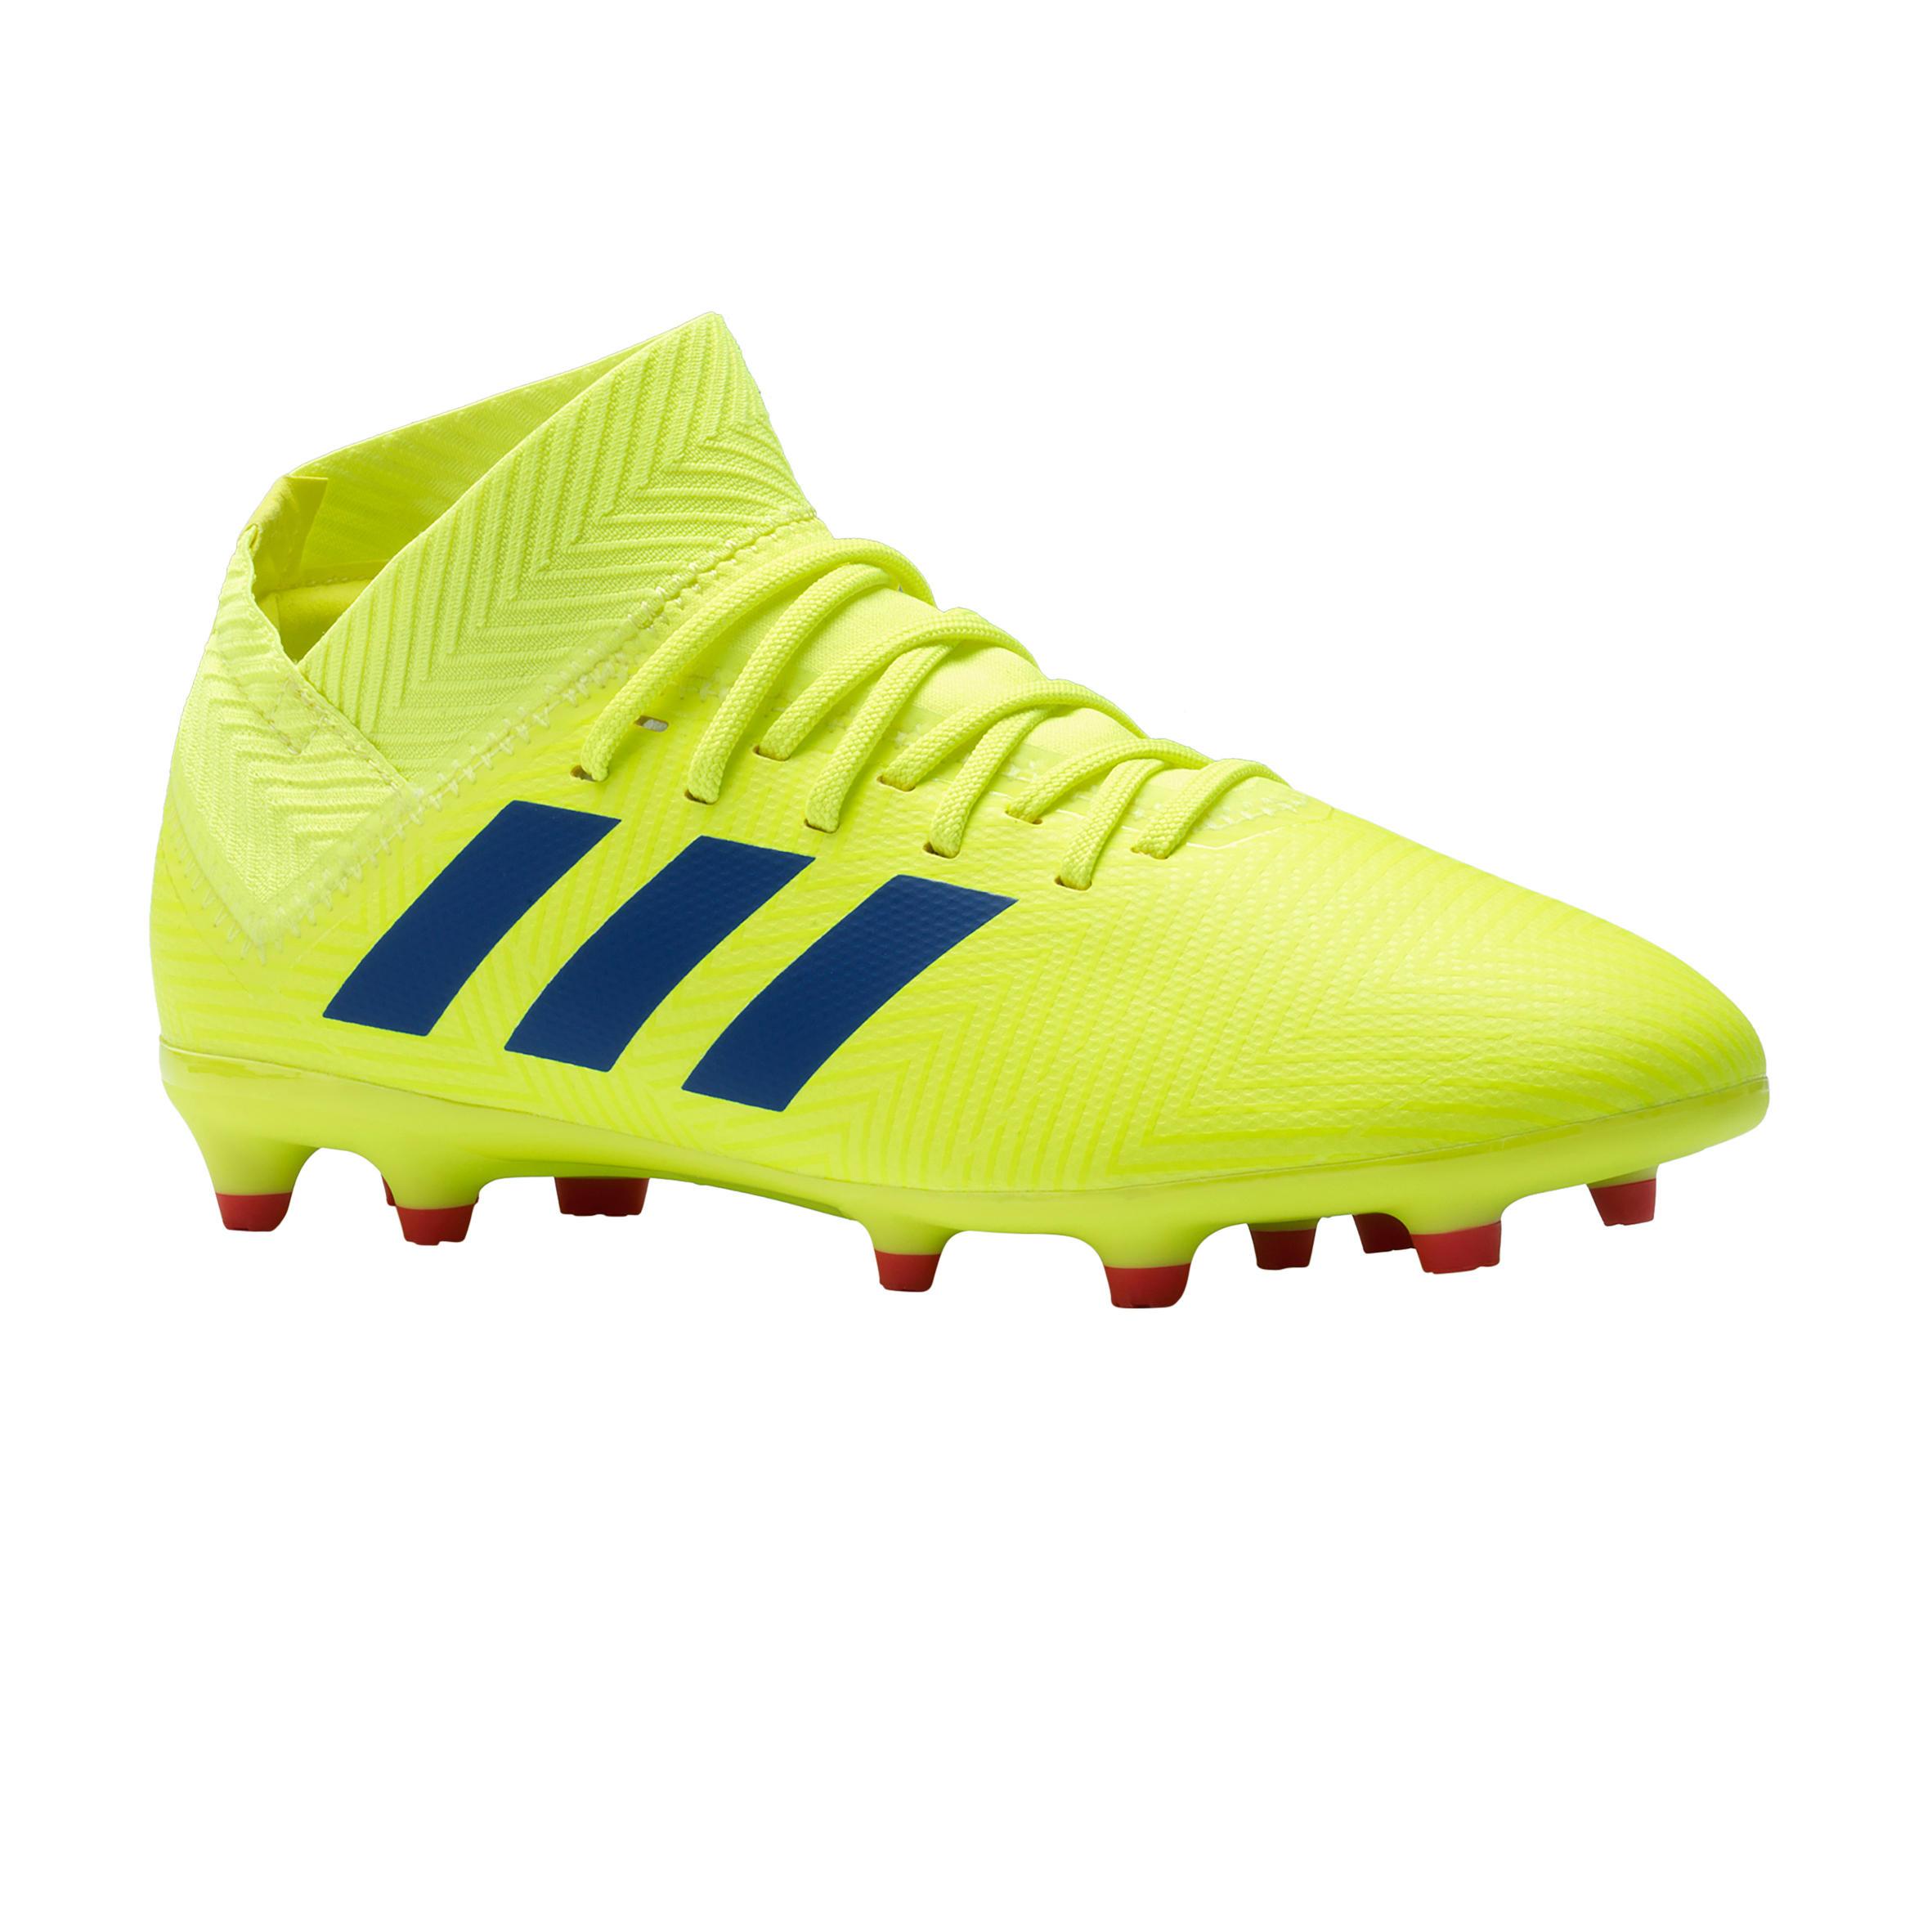 Adidas Voetbalschoenen kind Nemeziz 18.3 FG geel